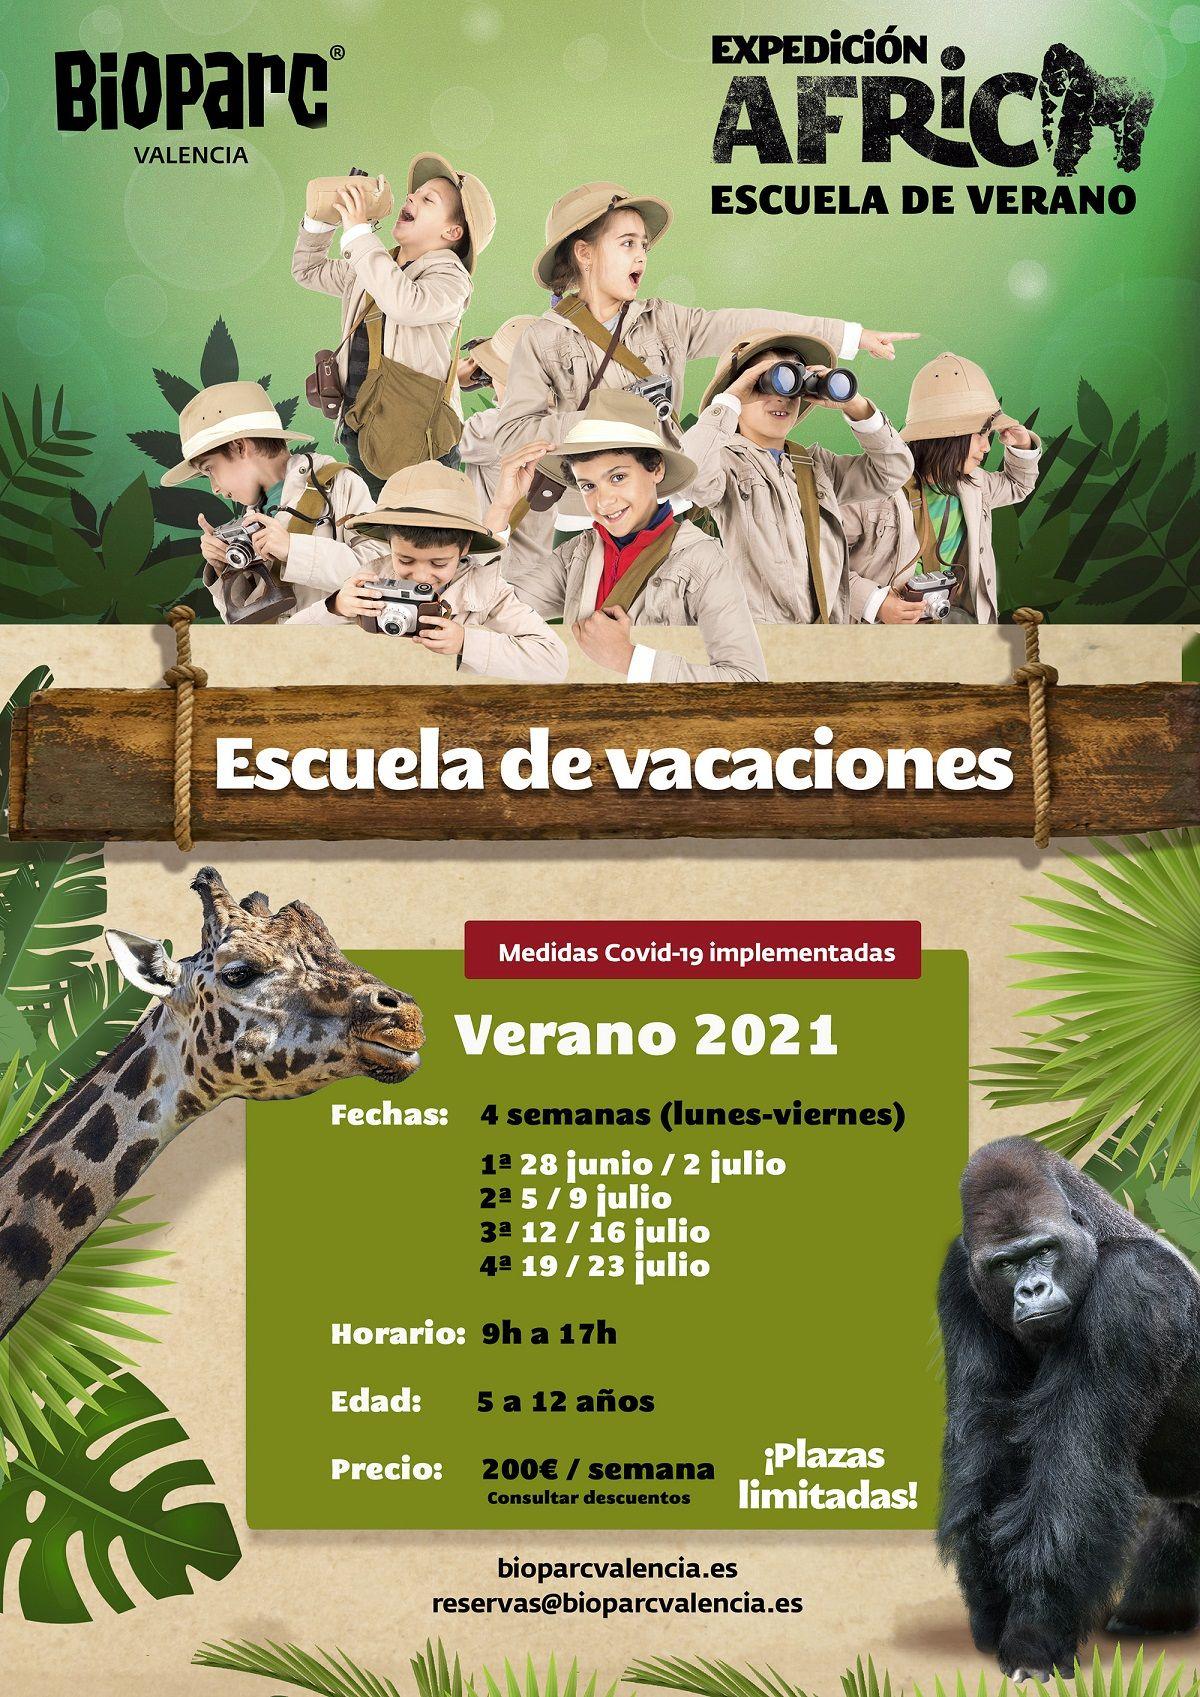 Expedición África: Escuela de verano de Bioparc Valencia valencia